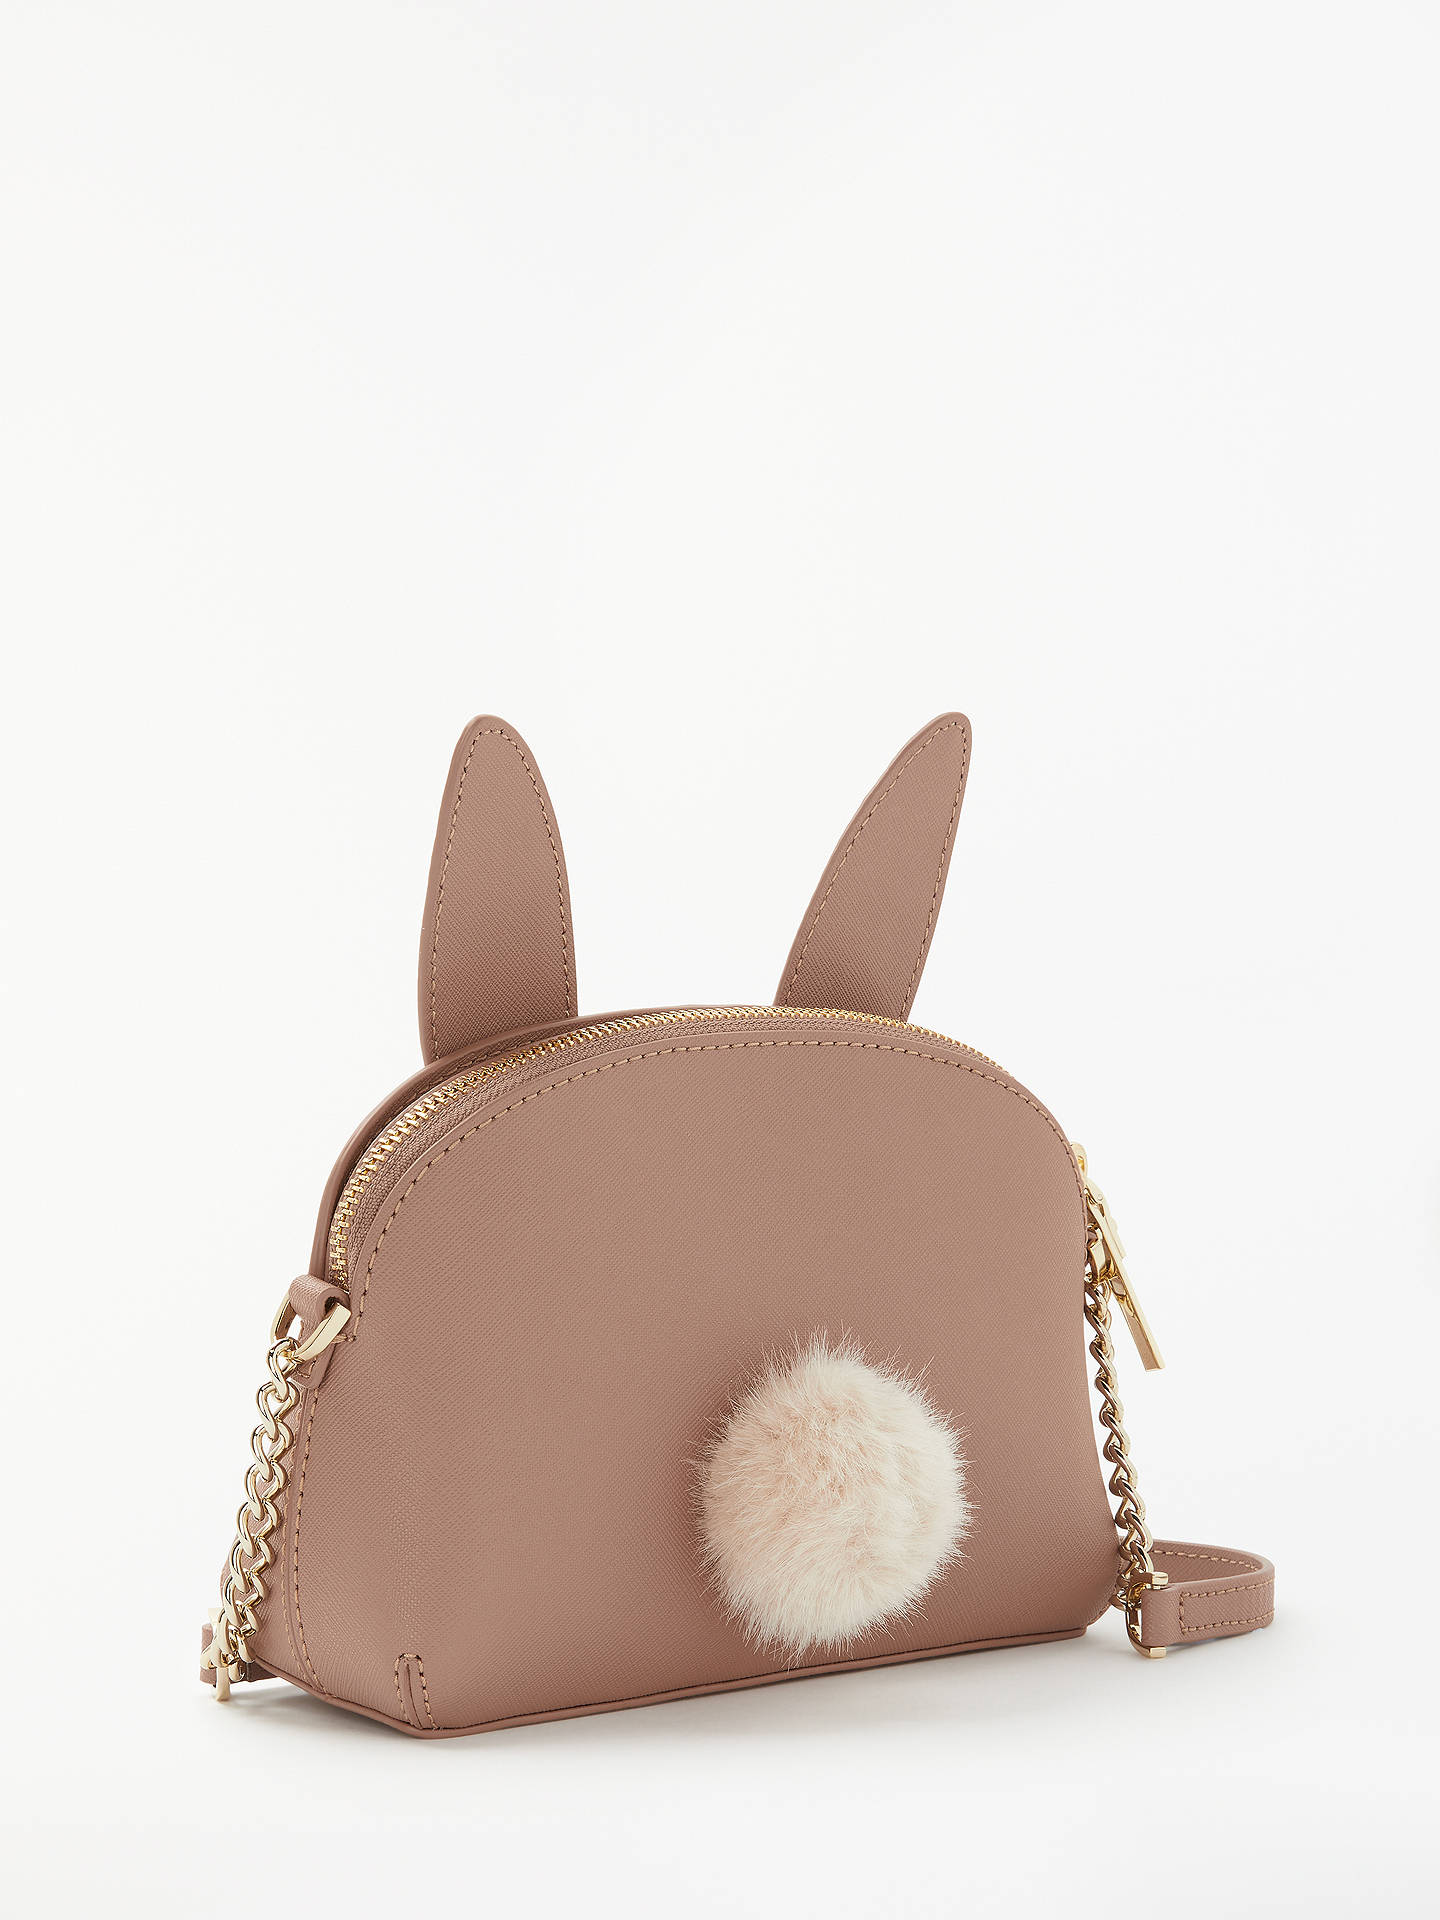 40467f4843f2 ... Buy kate spade new york Desert Muse Hilli Leather Rabbit Cross Body Bag